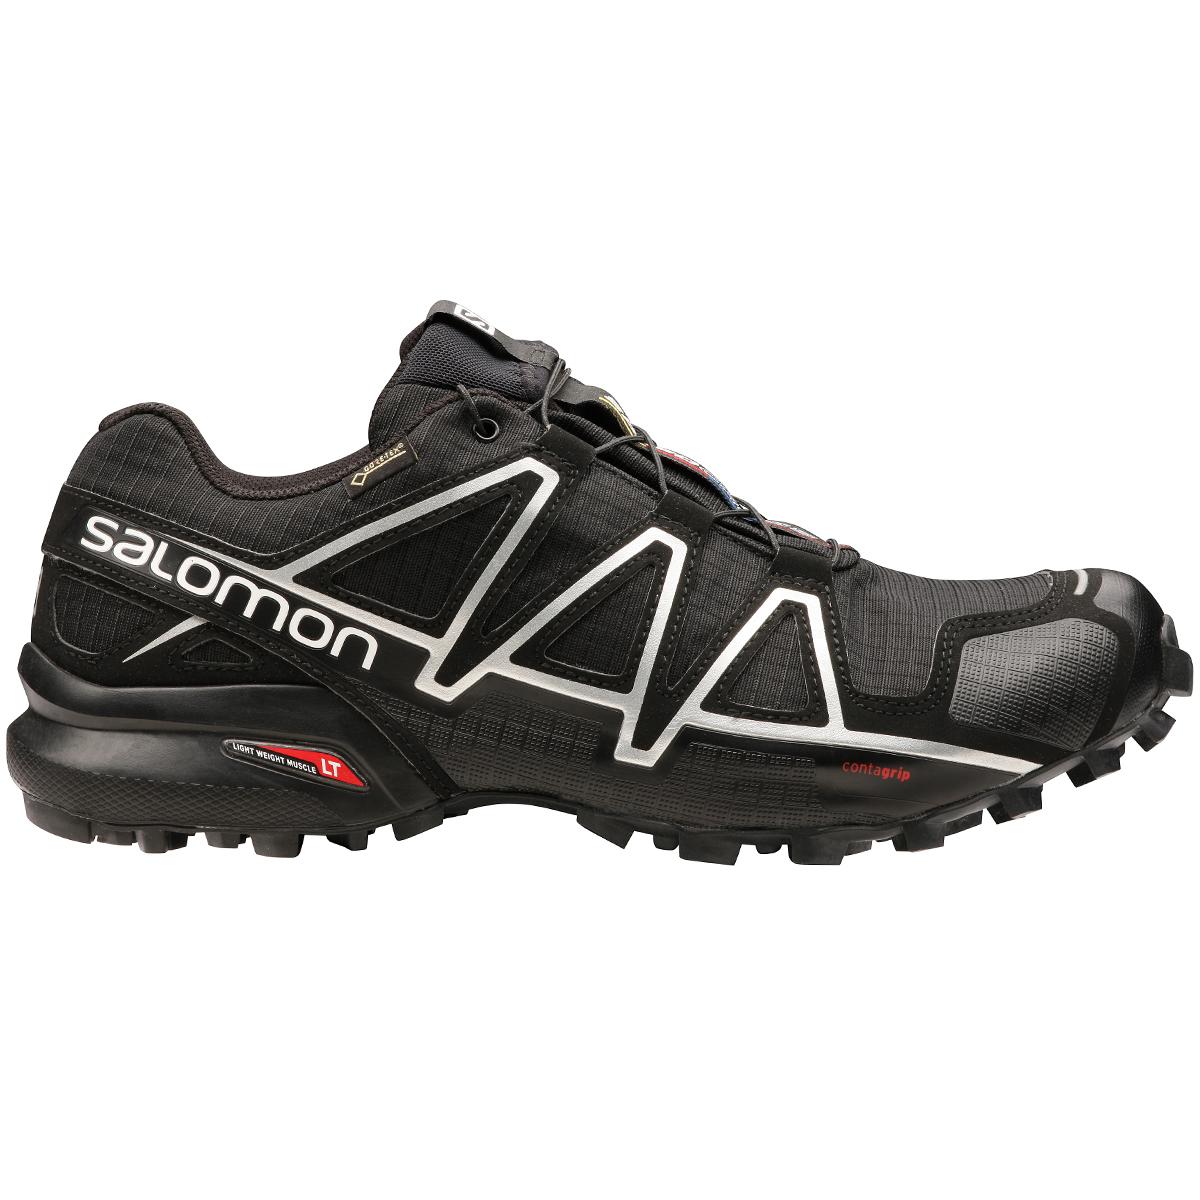 Salomon Men's Speedcross 4 Gtx Trail Running Shoes - Black, 13